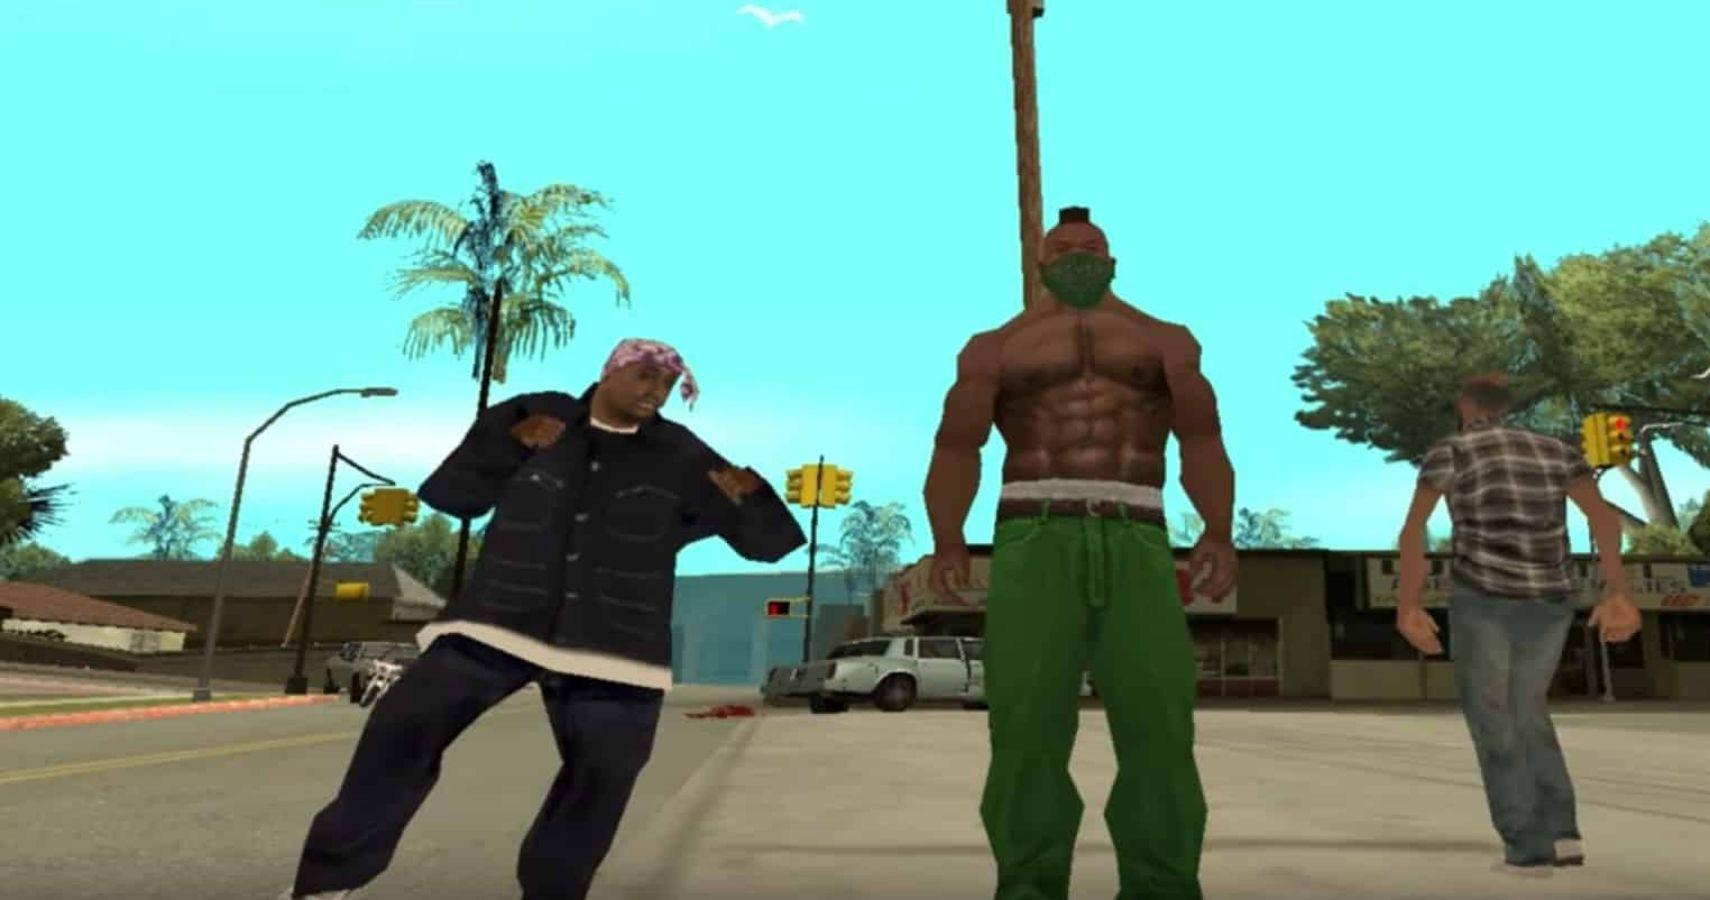 Take-Two CEO Appreciates Interest In GTA Remasters But Leaving Decision To Rockstar